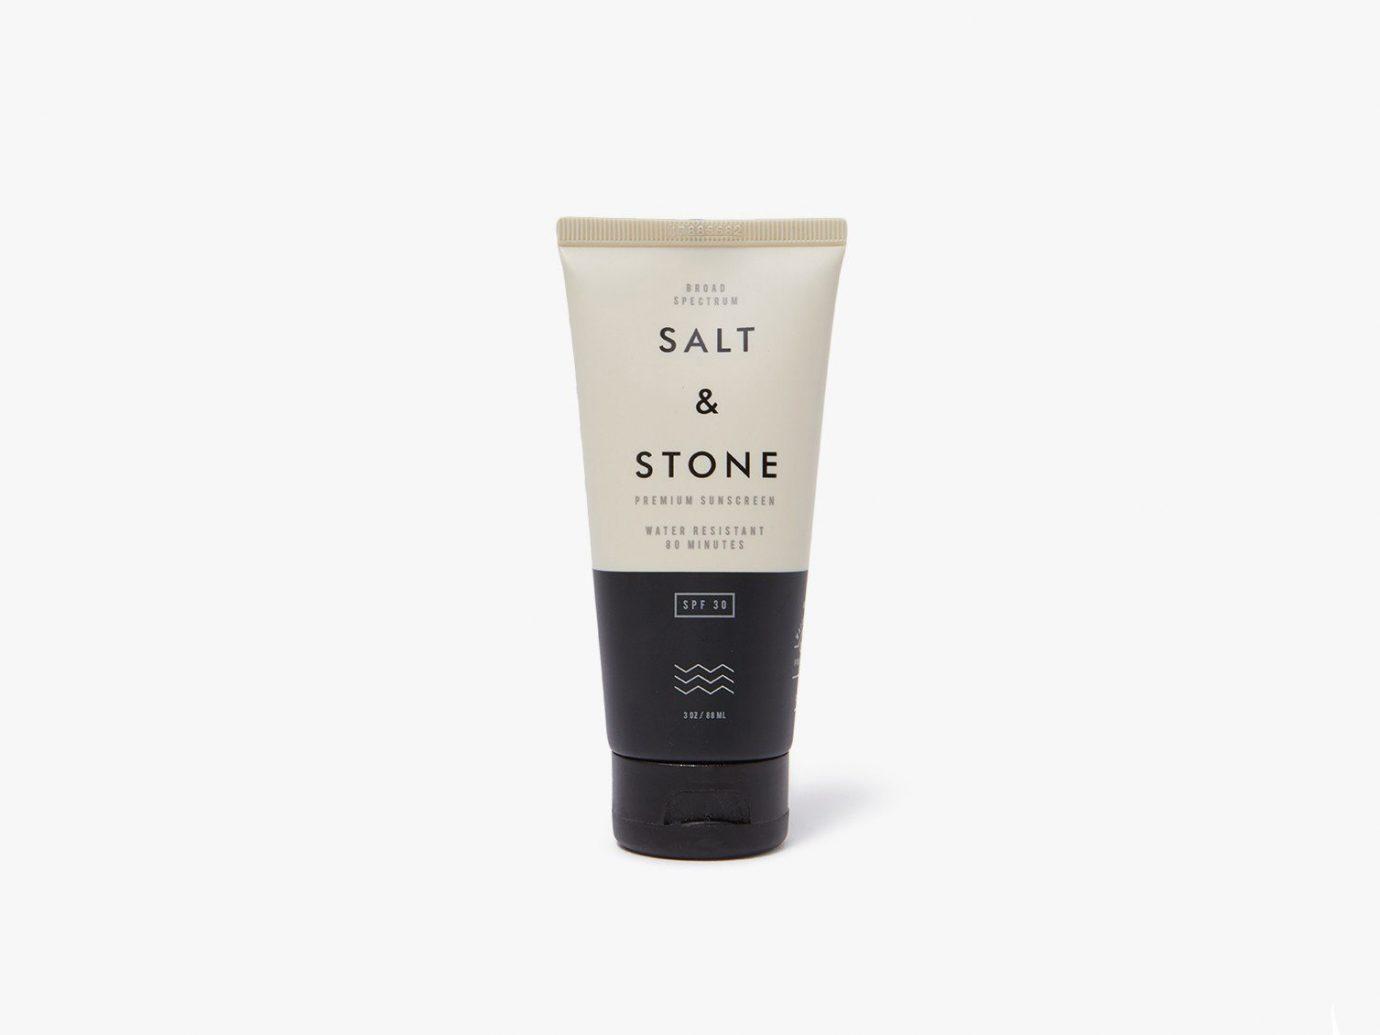 Beach Style + Design Travel Shop product skin care cream health & beauty cosmetics skin cream